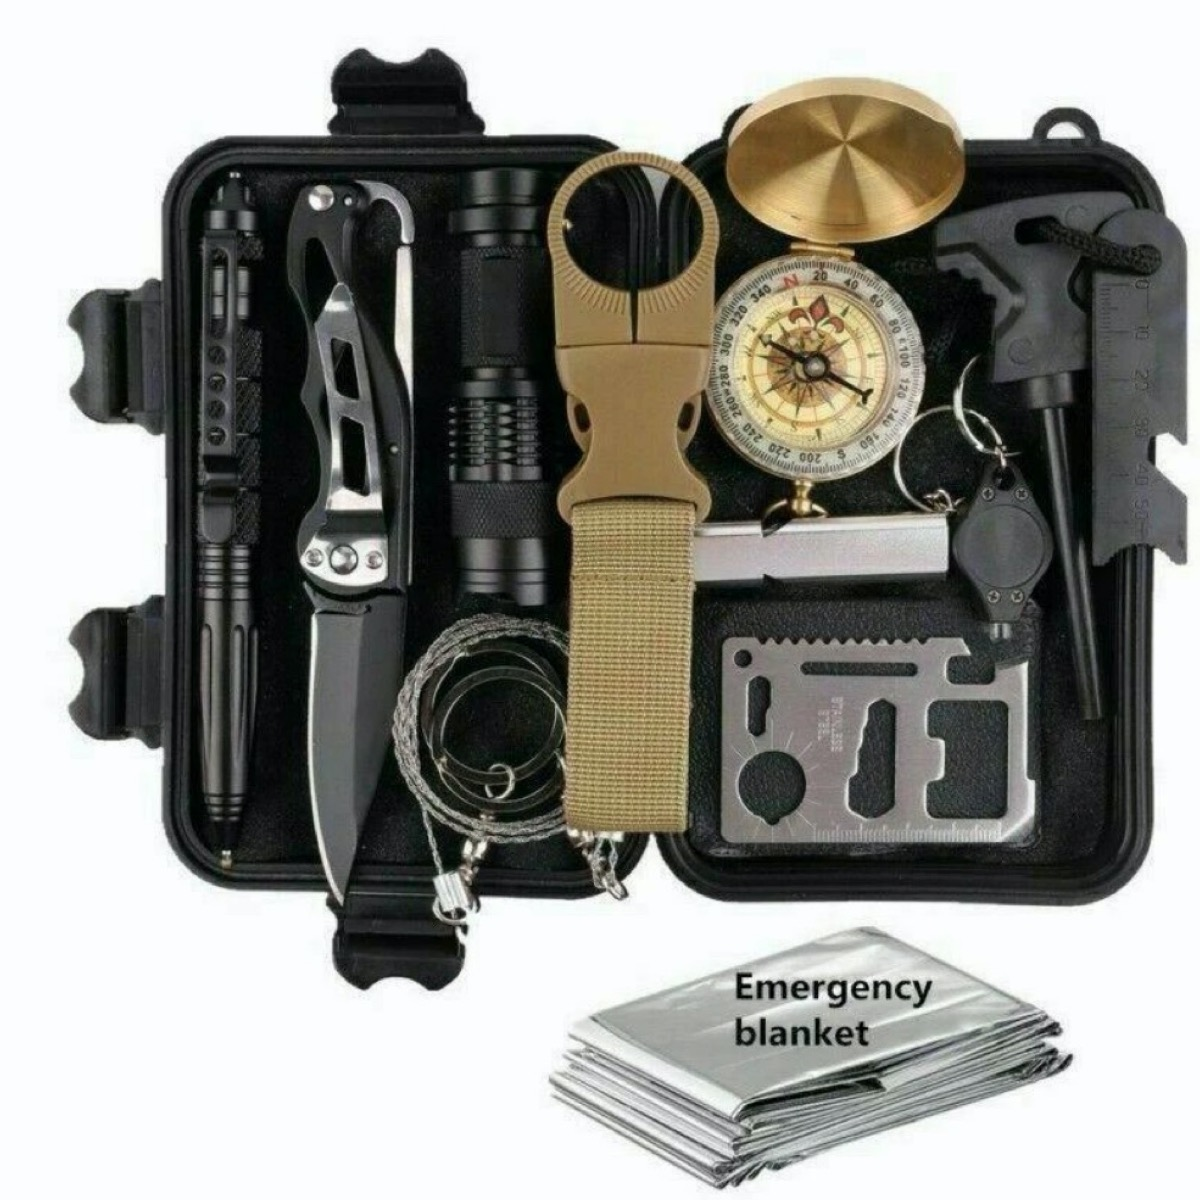 black box full of tactical gear